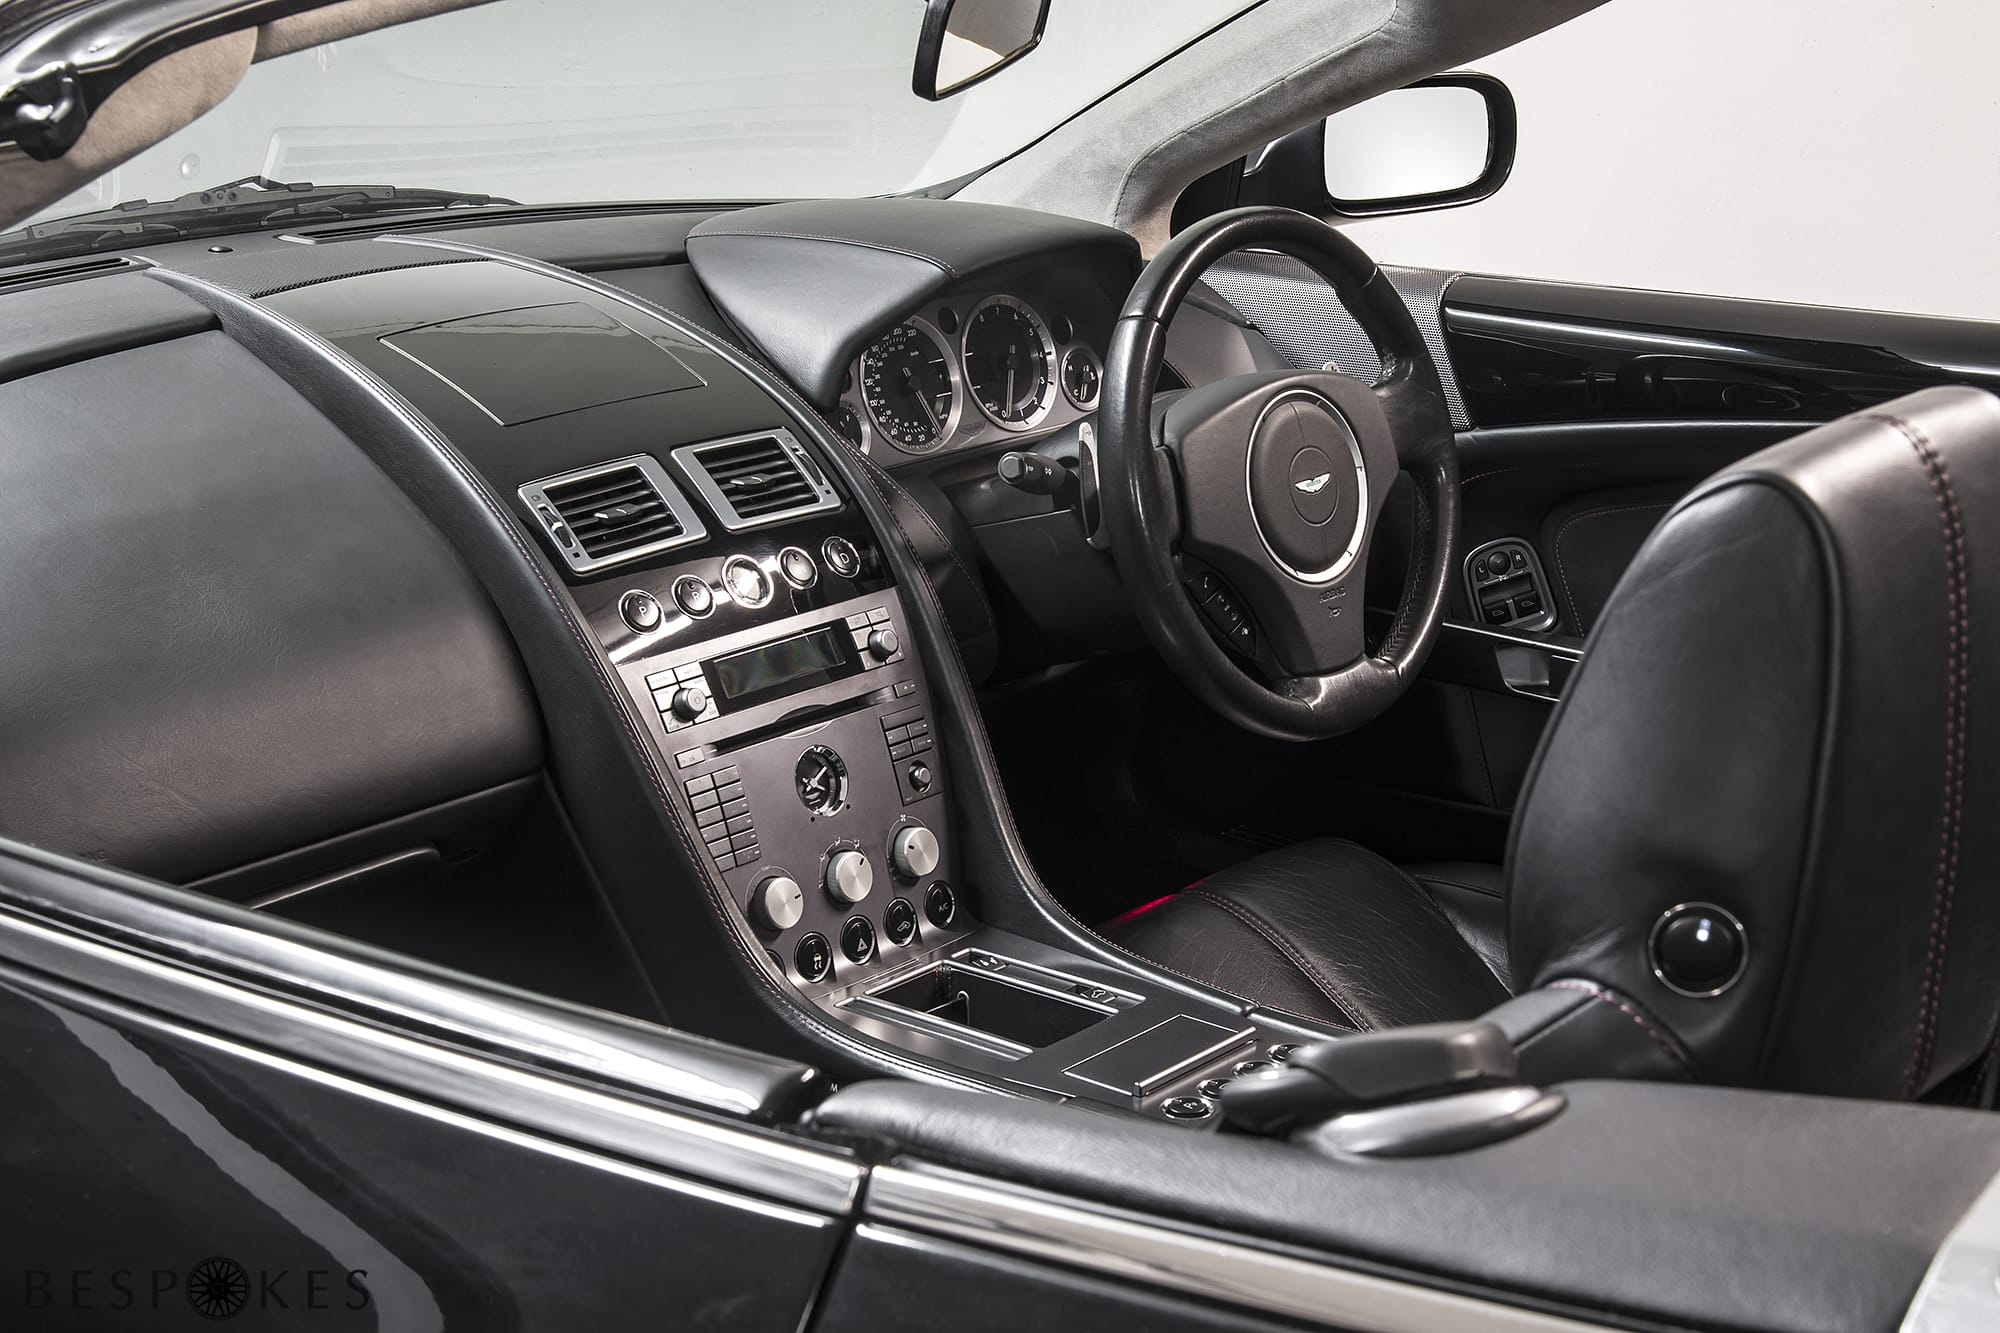 Aston Martin DB12 Volante | Bespokes | aston martin db9 interior